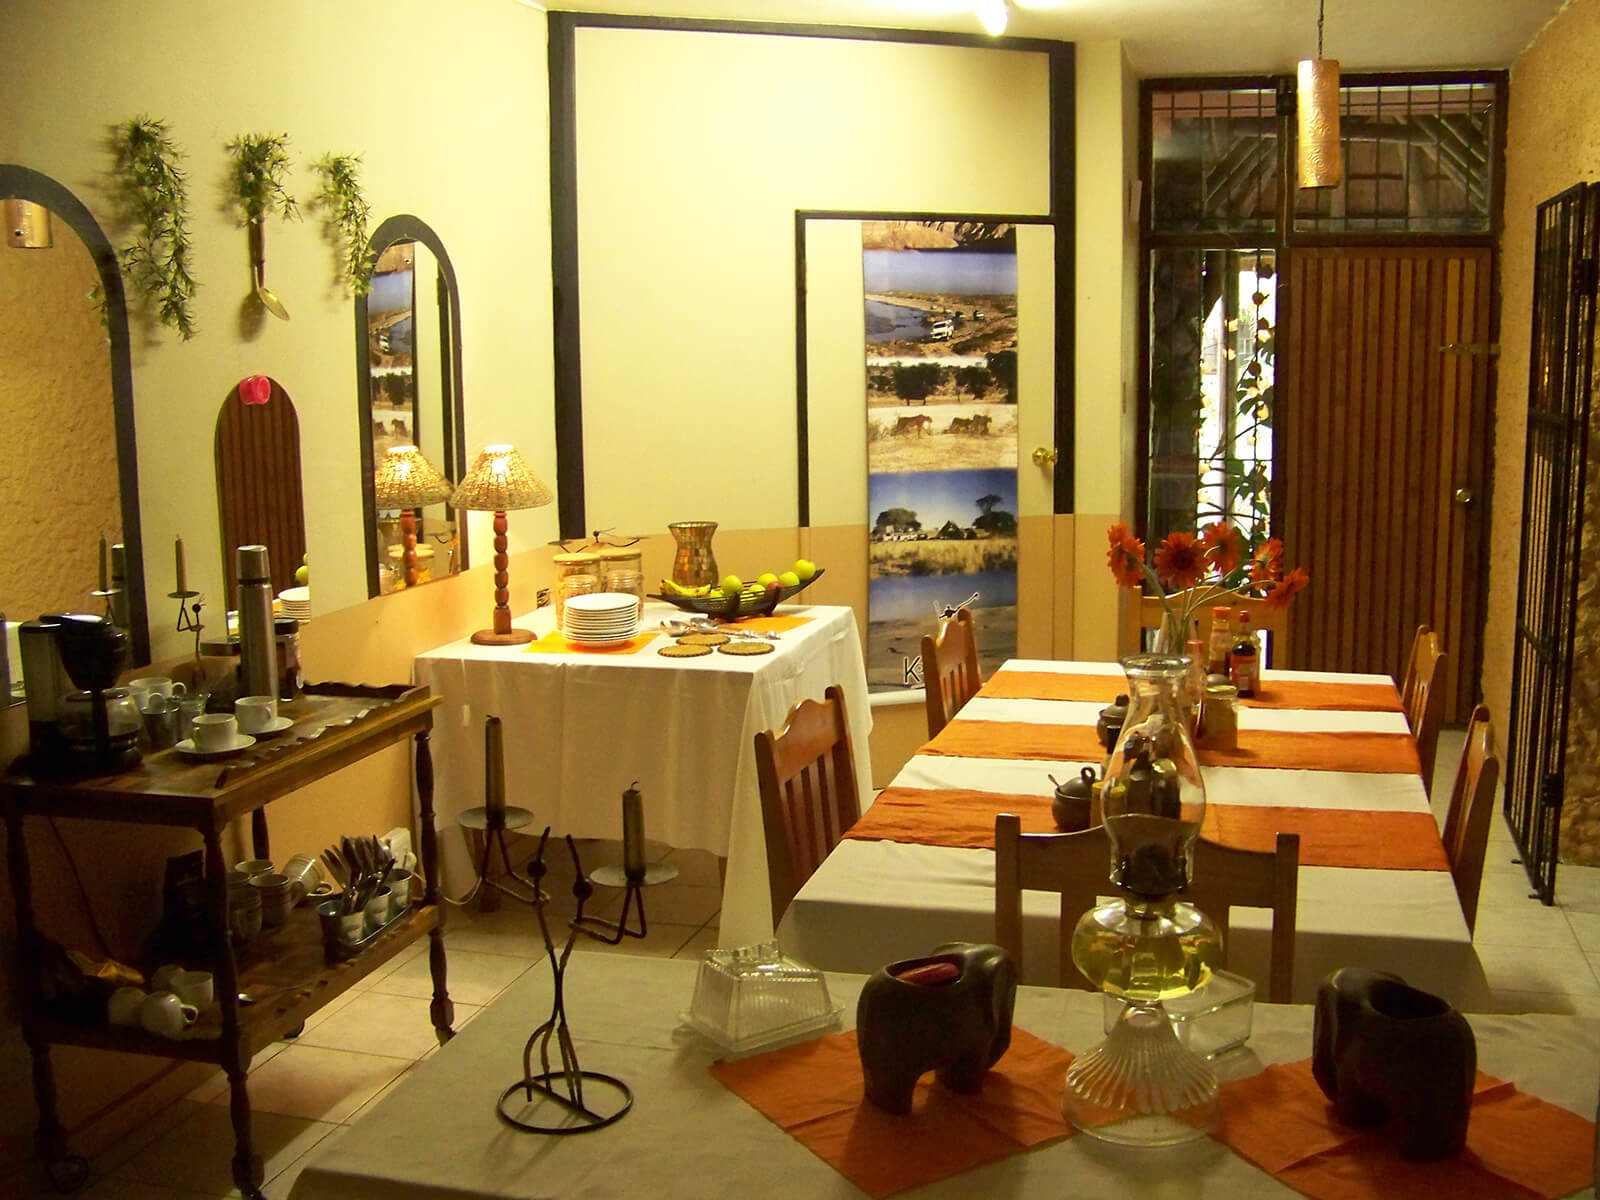 09 Mazurka Waters - Dining room